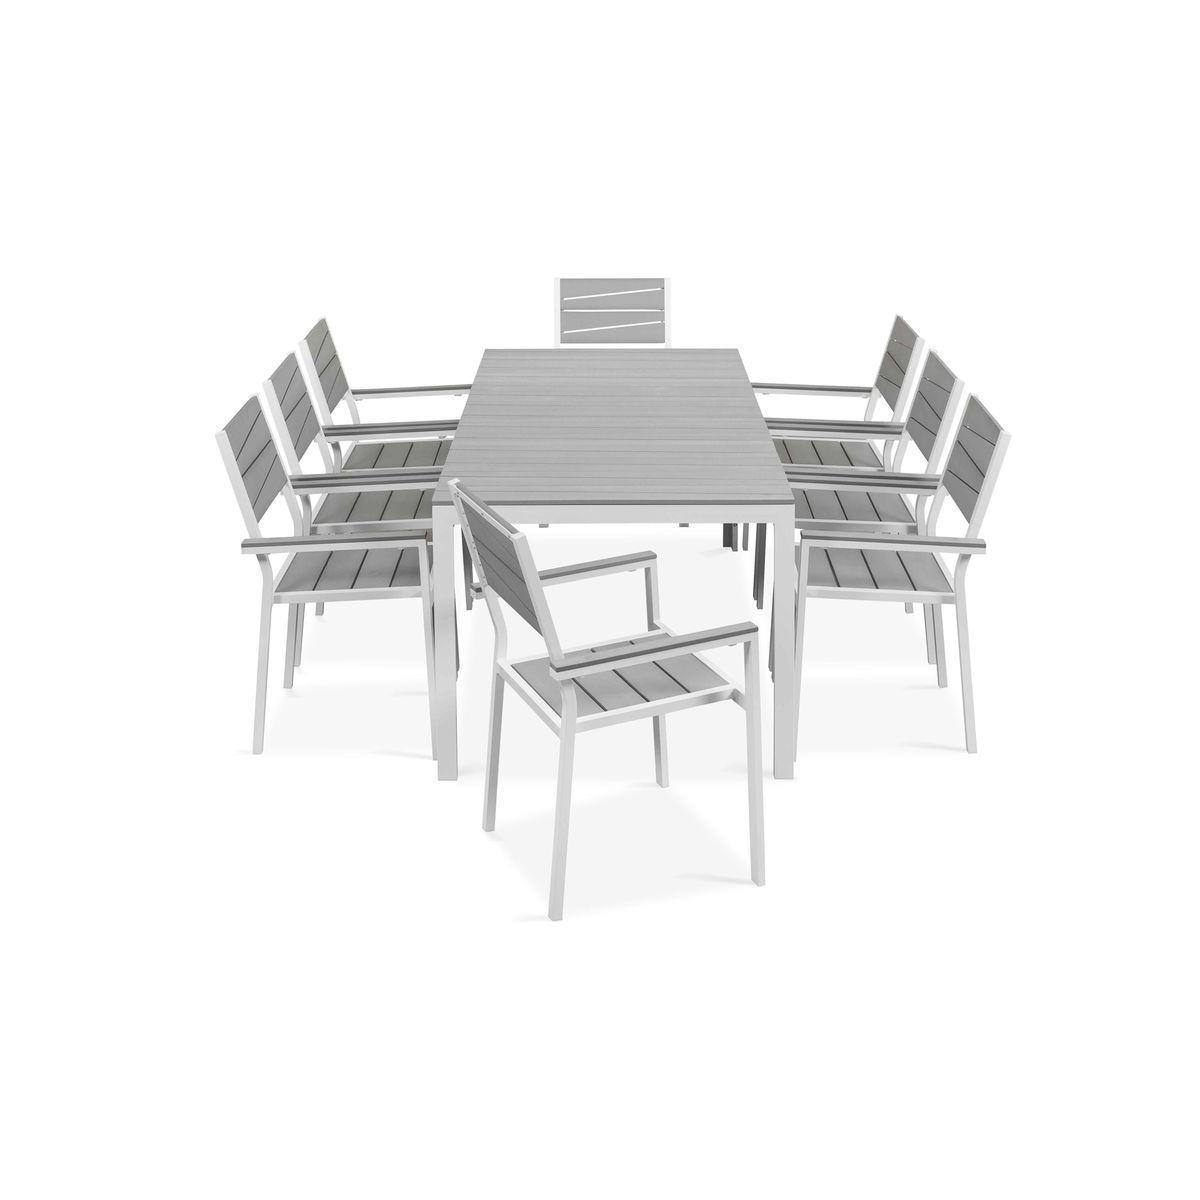 Table De Jardin 8 Places Aluminium Et Polywood, Saint ... destiné Salon De Jardin Polywood